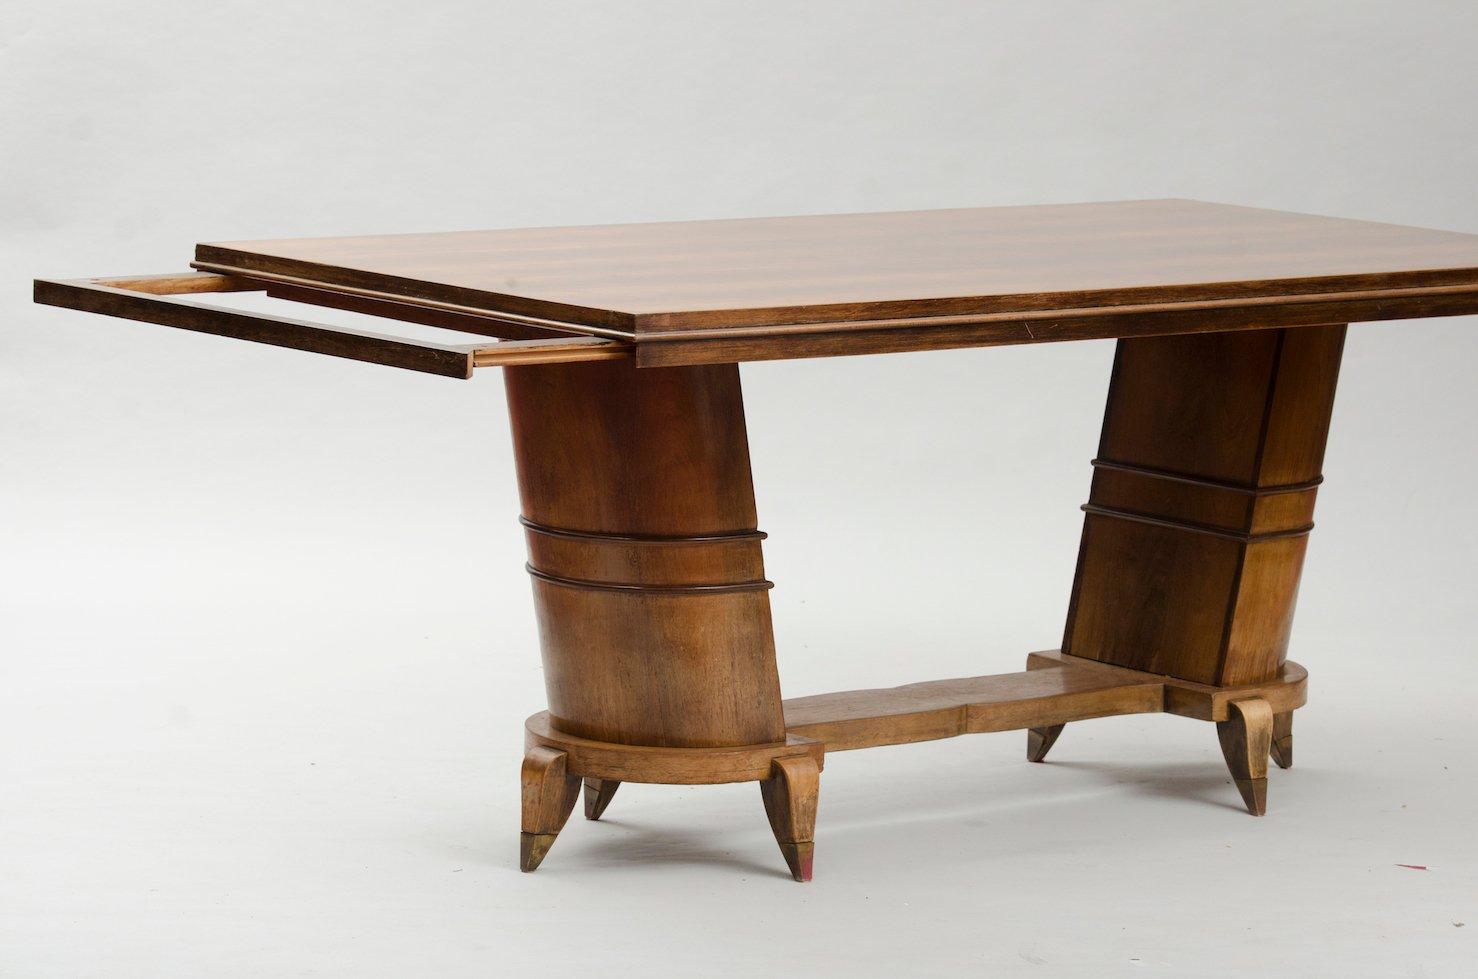 Vintage Art Deco Dining Table 7 587200 Price Per Piece